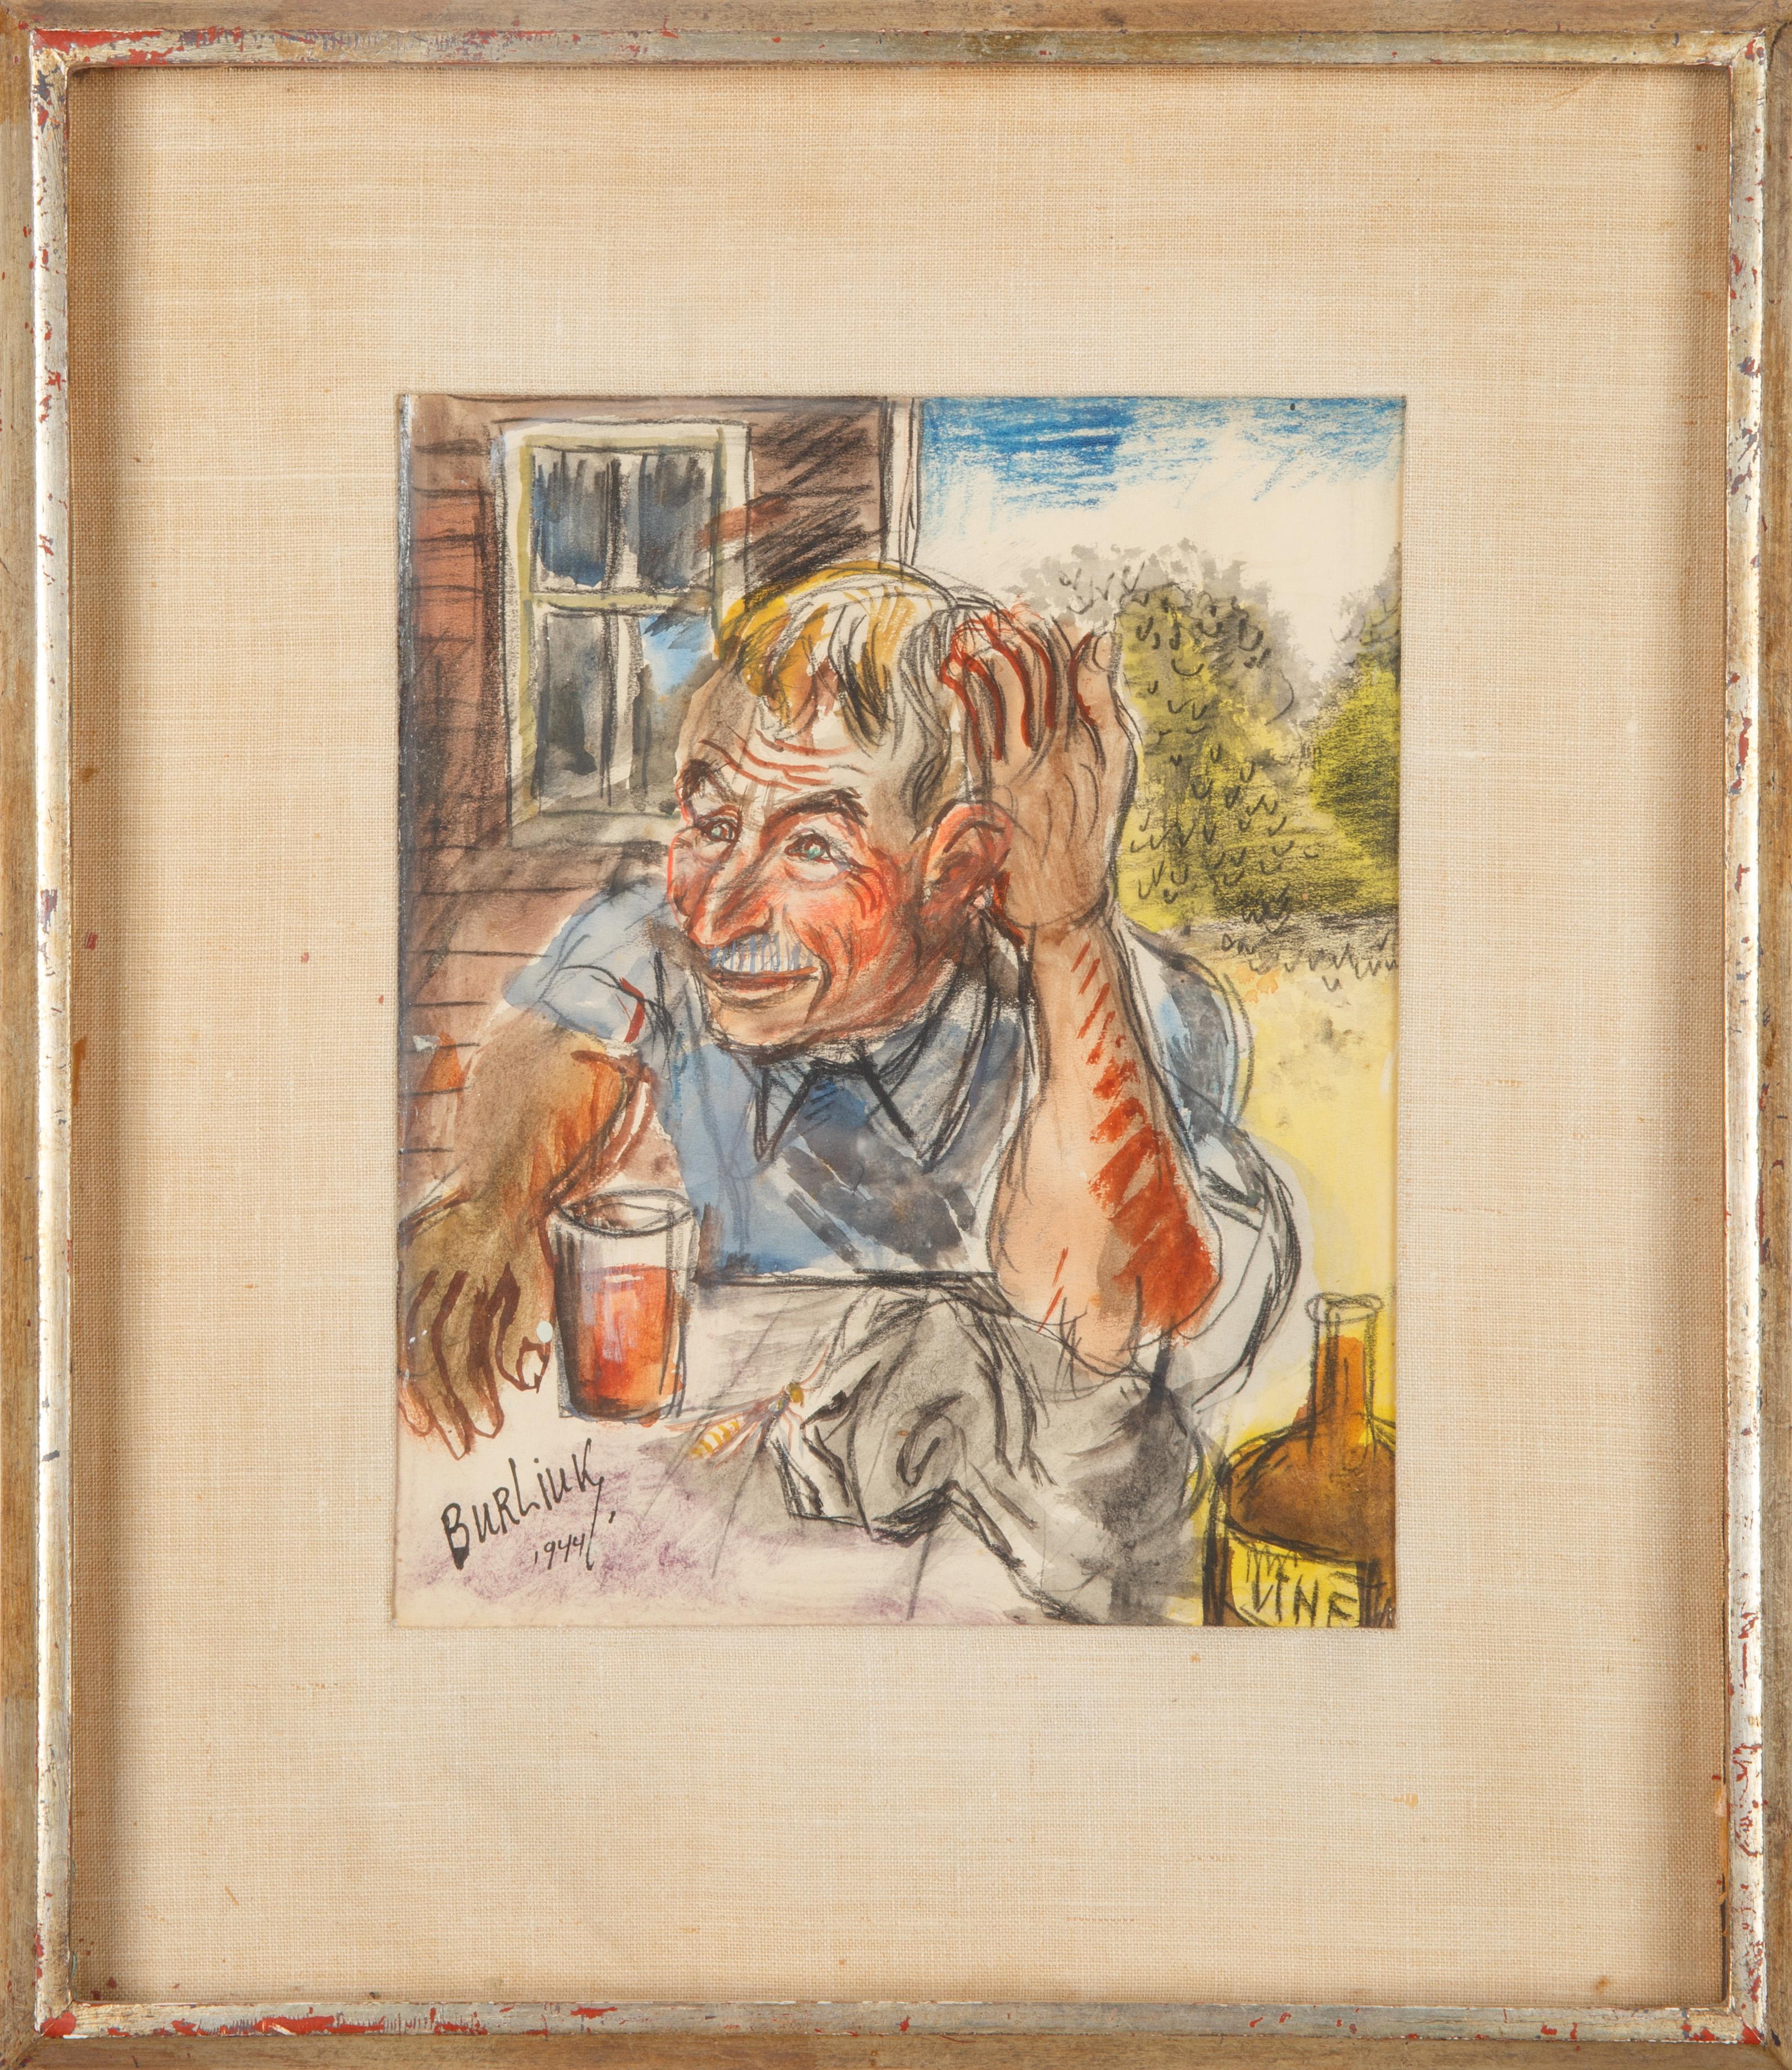 DAVID BURLIUK (RUSSIAN 1882-1967) - Image 2 of 5